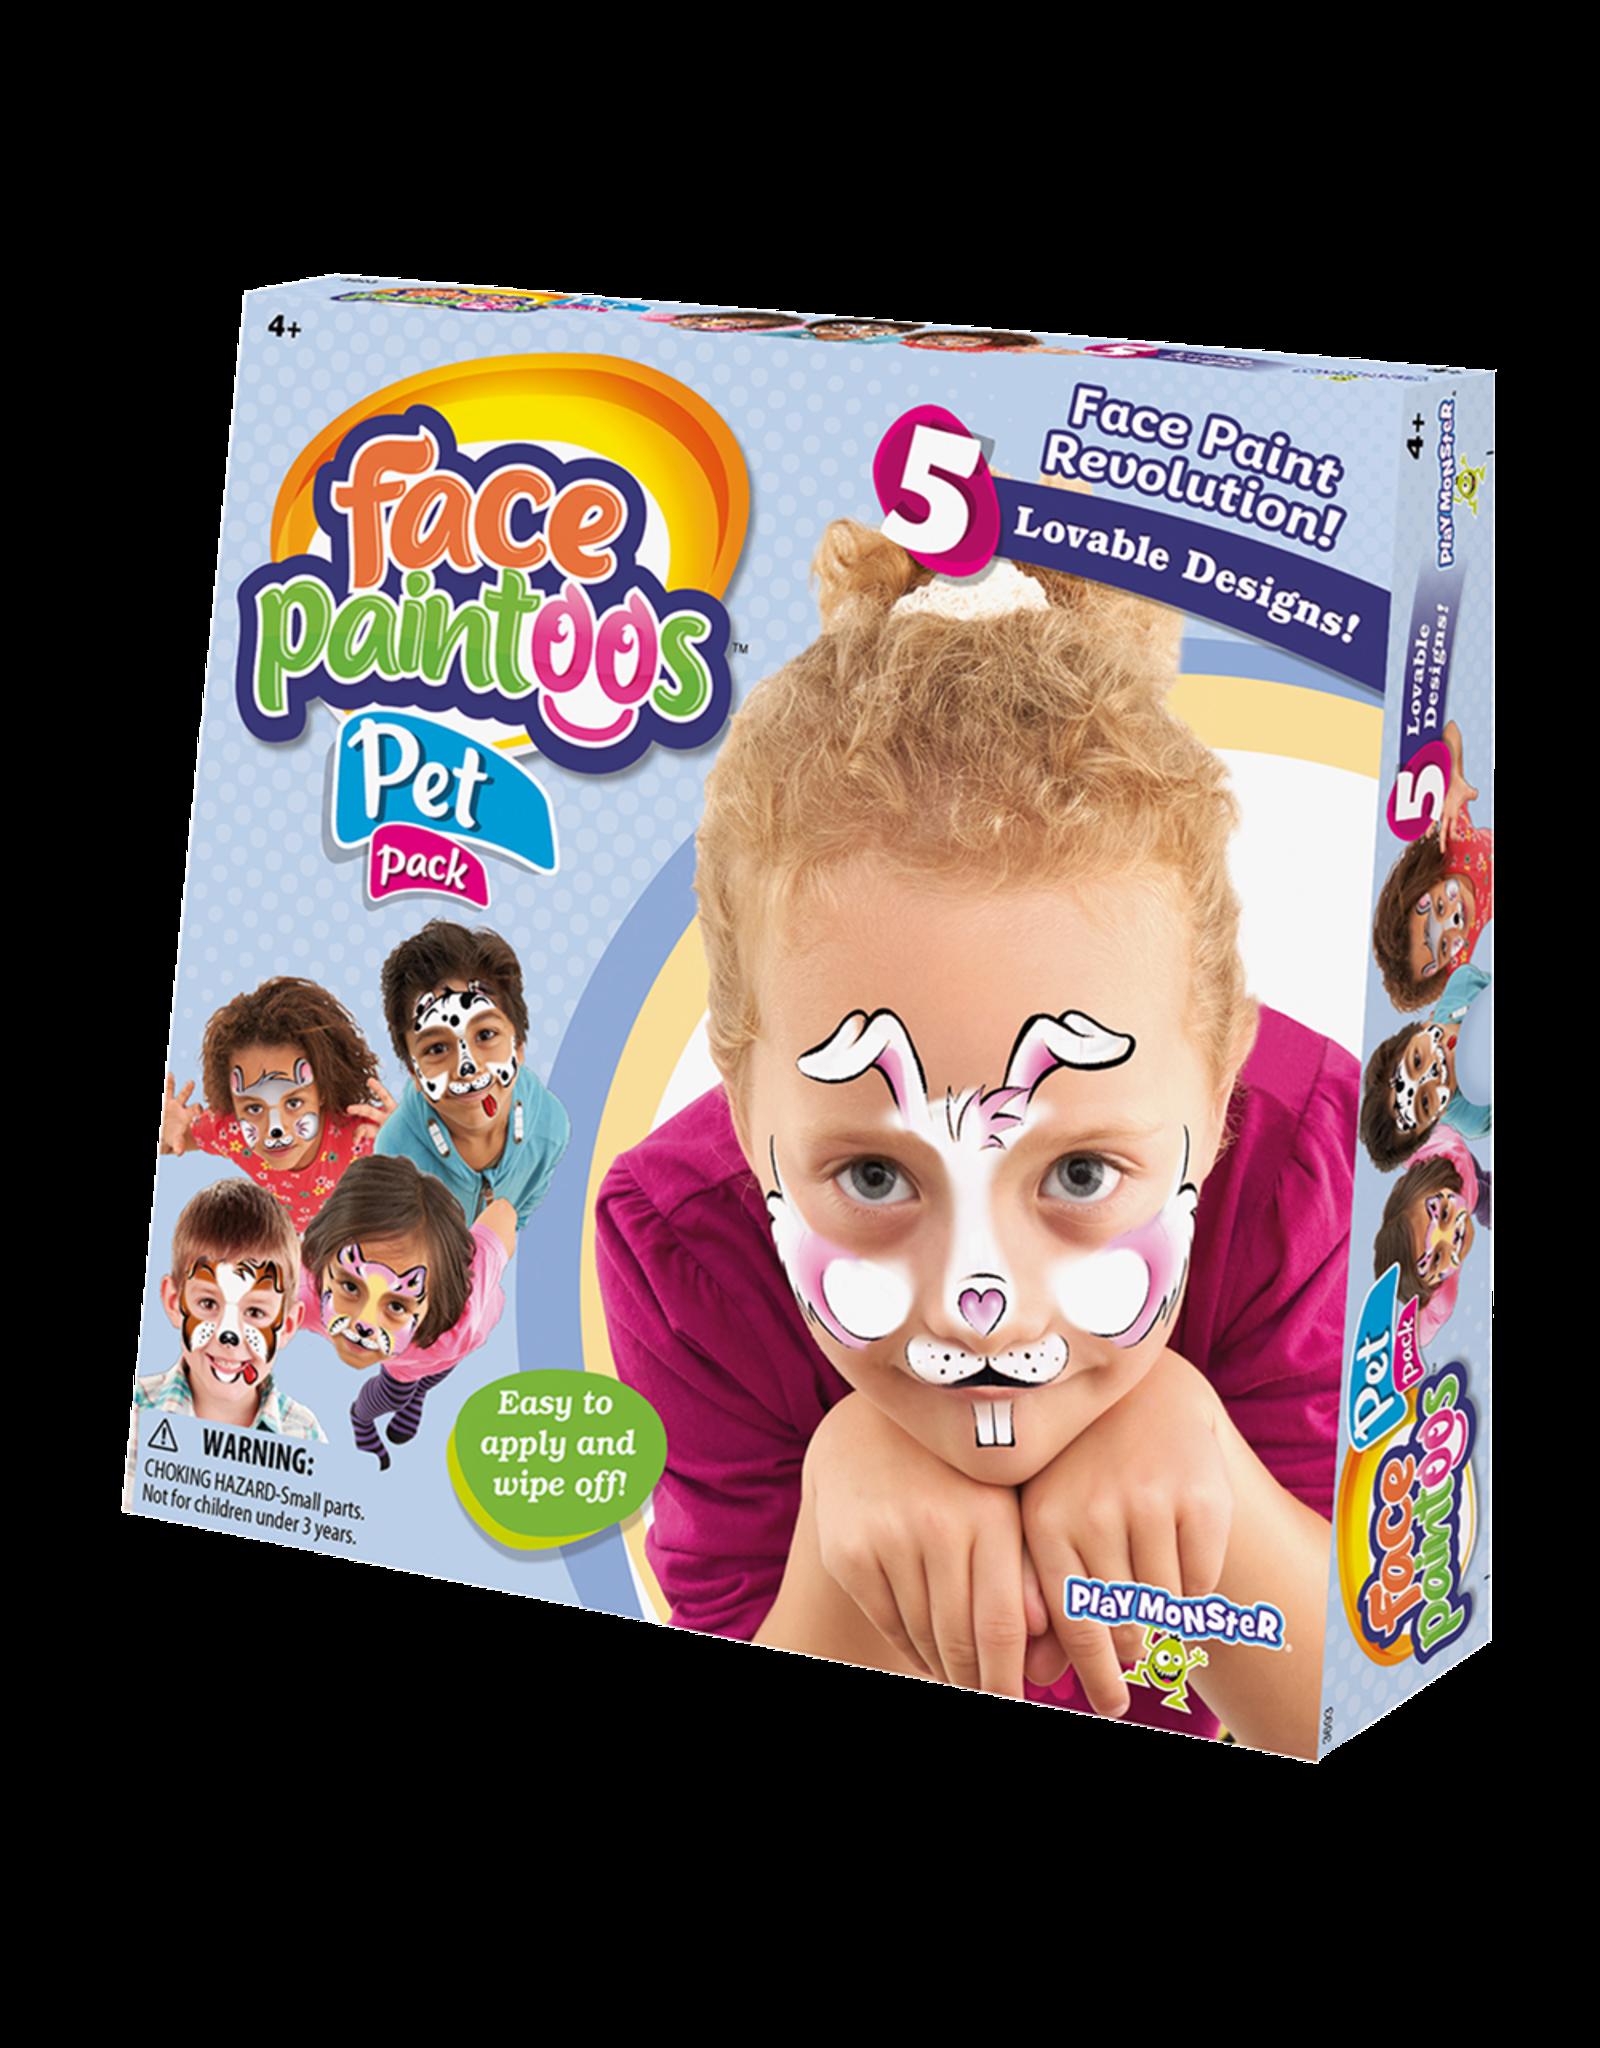 PLAYMONSTER FACE PAINTOOS PET PACK